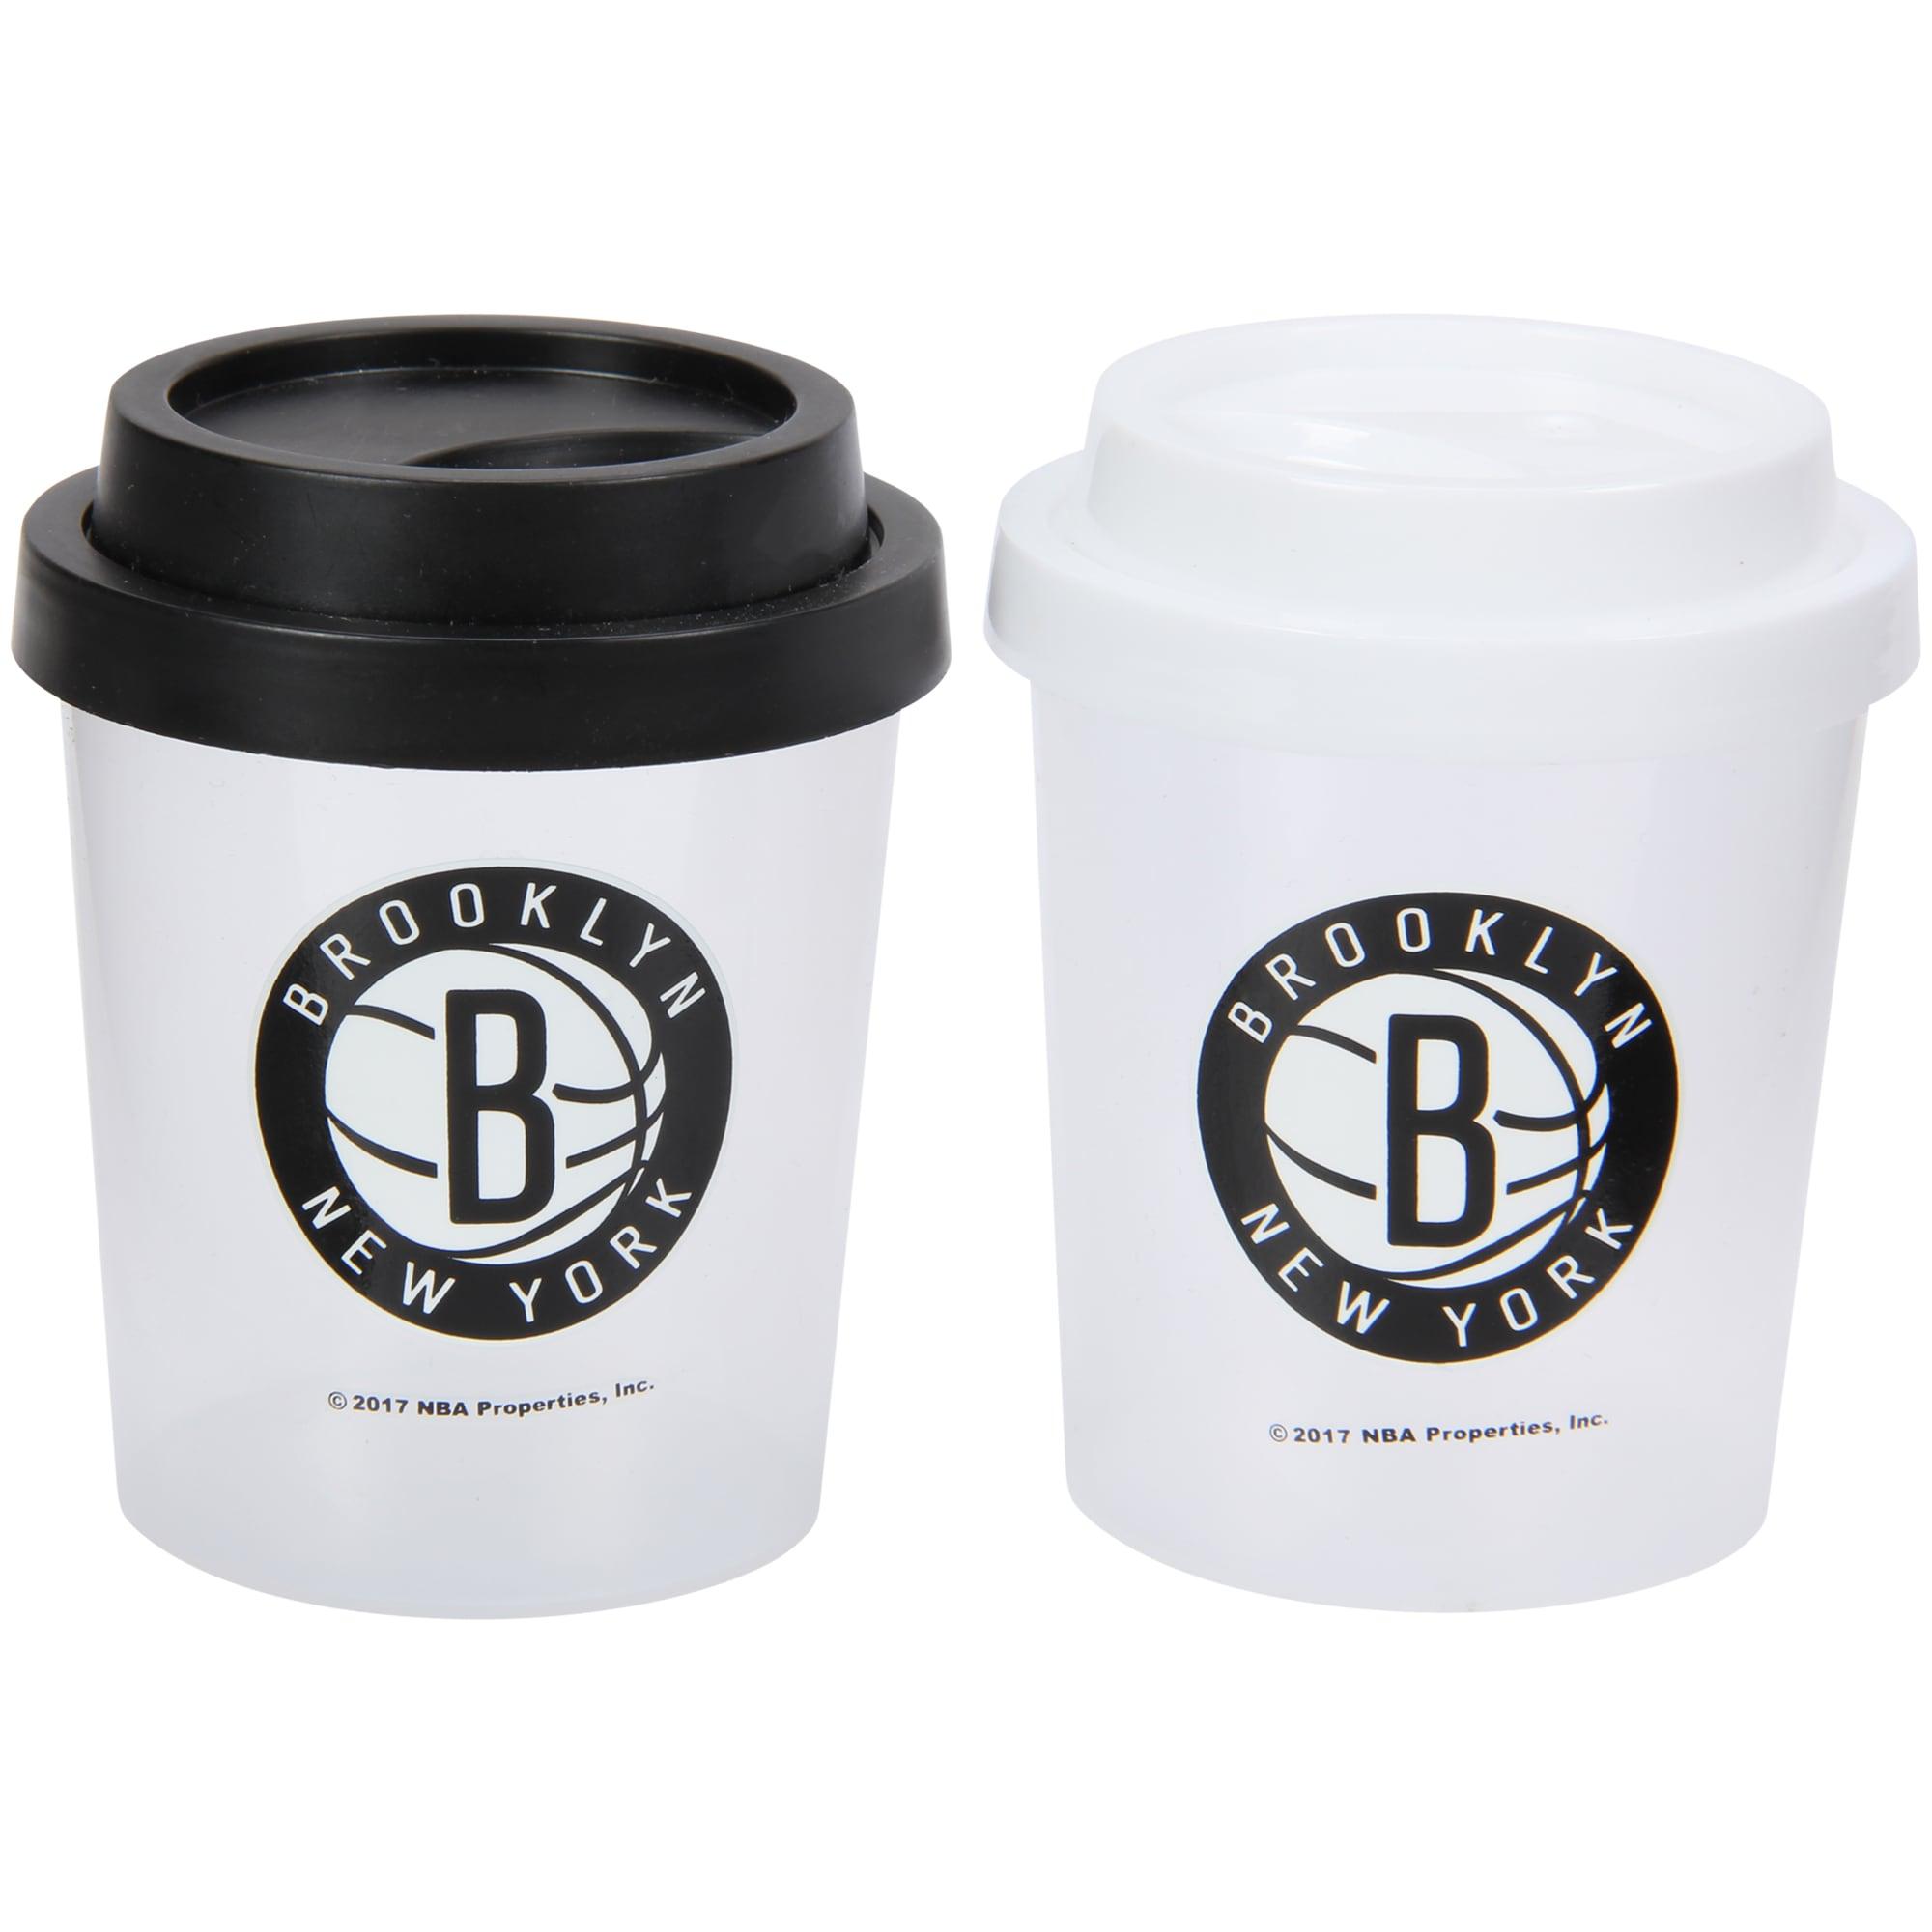 Brooklyn Nets Plastic Salt & Pepper Shaker